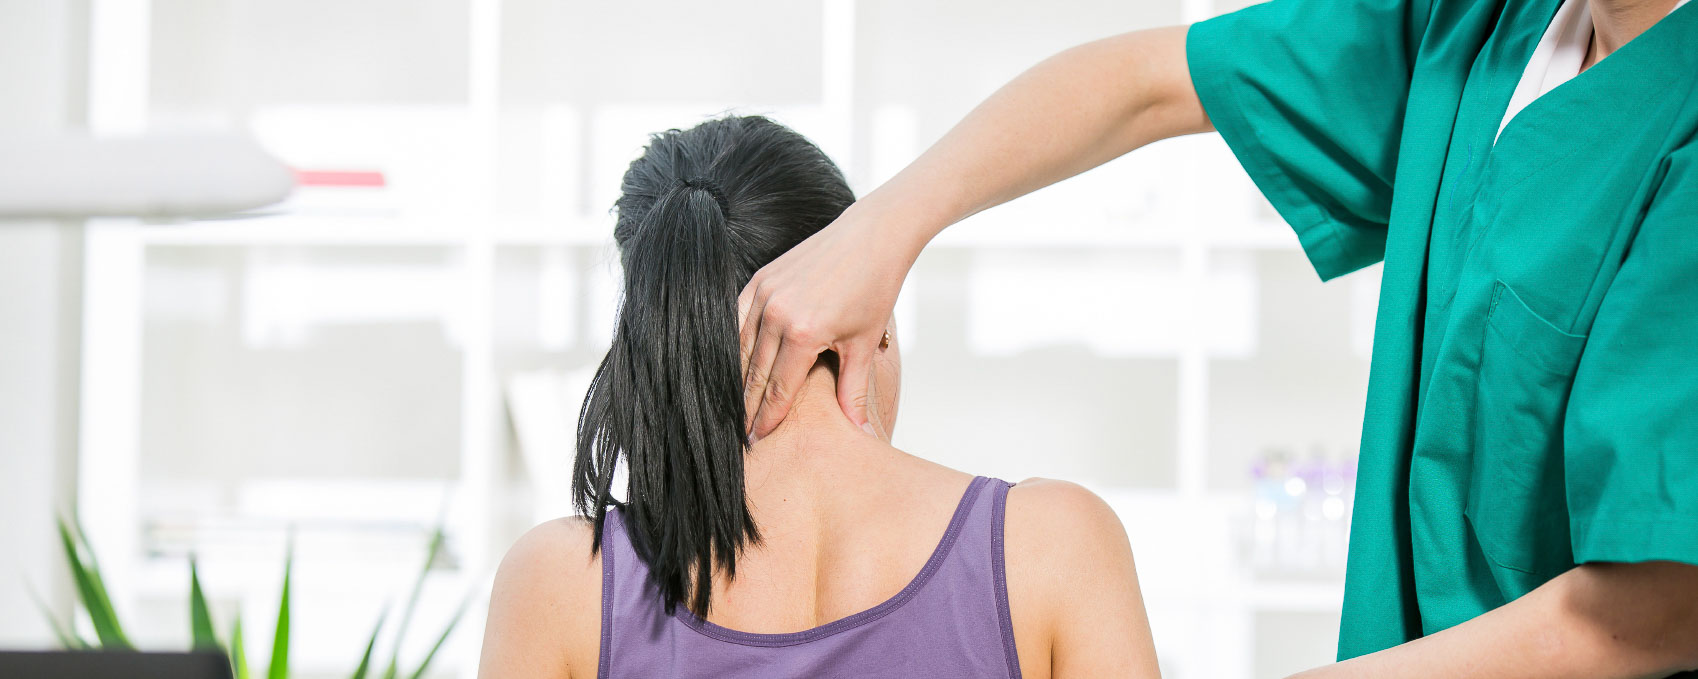 SOS ostéopathe - Ostéopathe Charenton